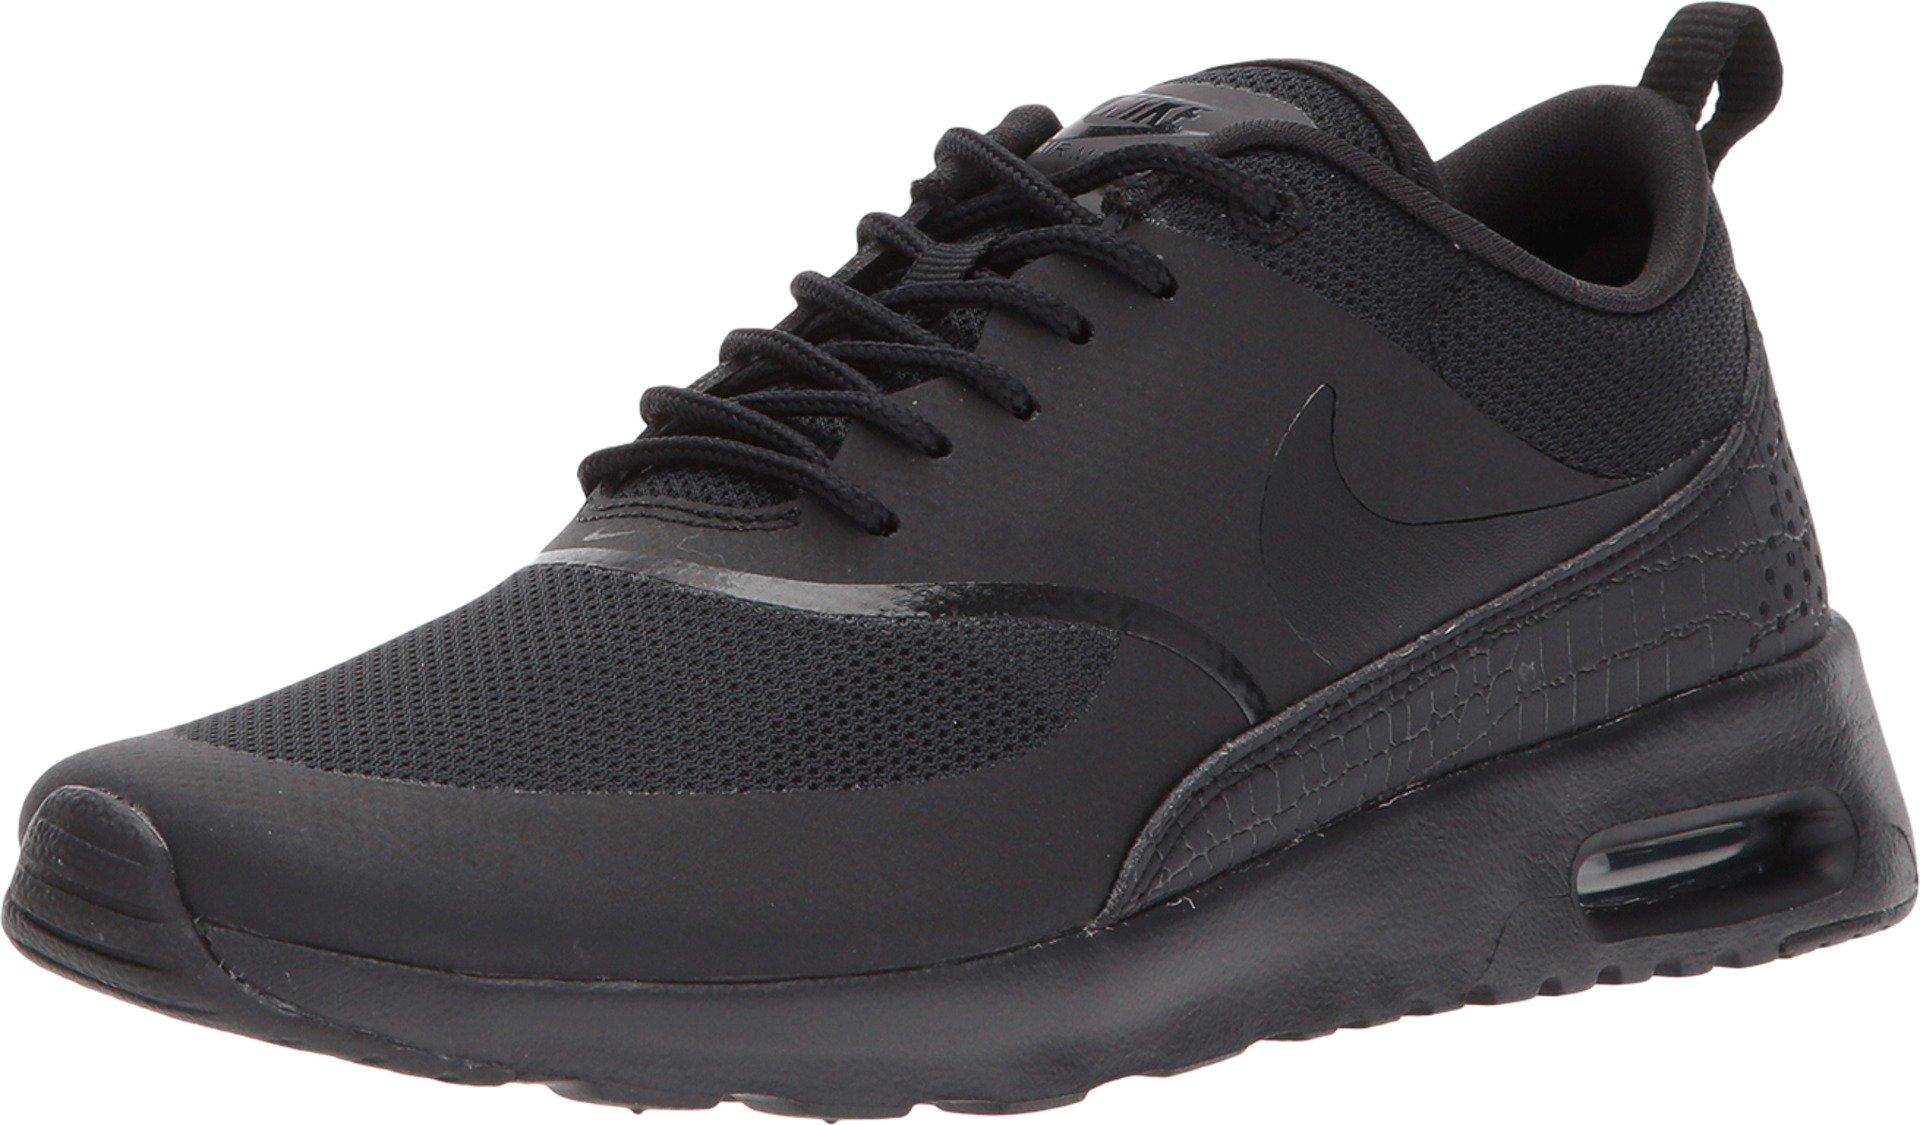 Nike Air Max Thea Women's Running Shoes BlackBlack 599409 025 (9 B(M) US)